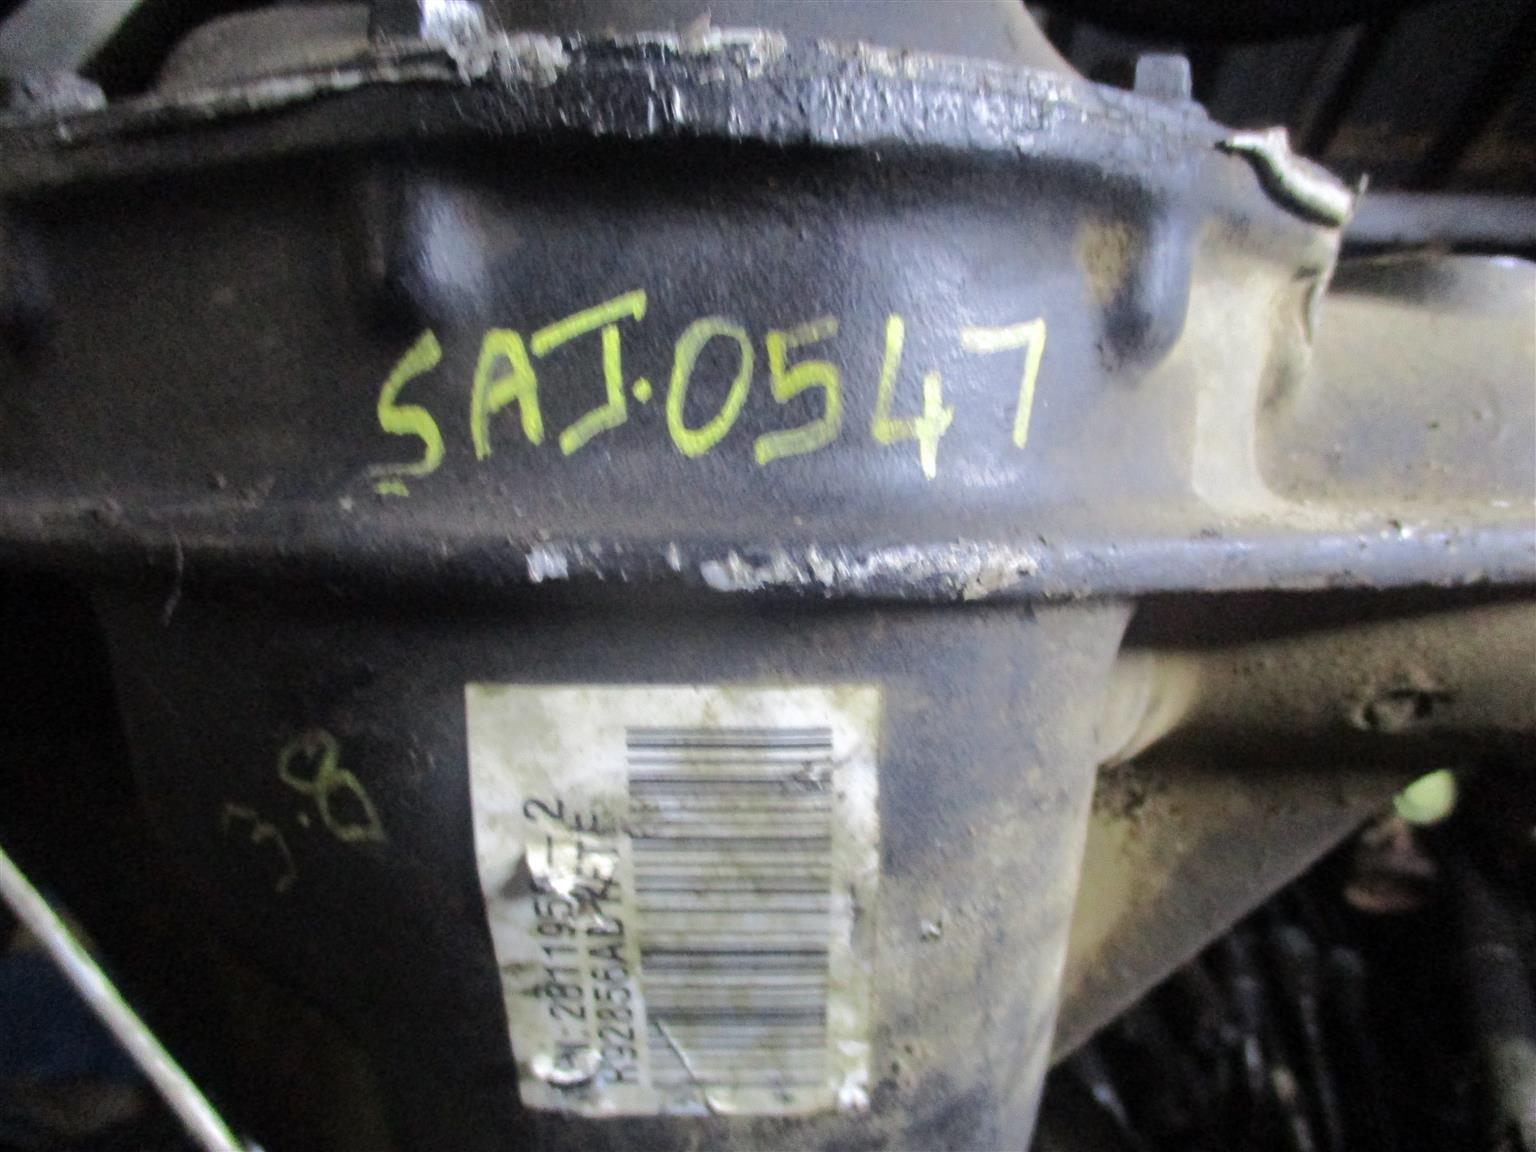 JEEP WRANGLER 3.6 SAHARA 2012 DIFF FOR SALE